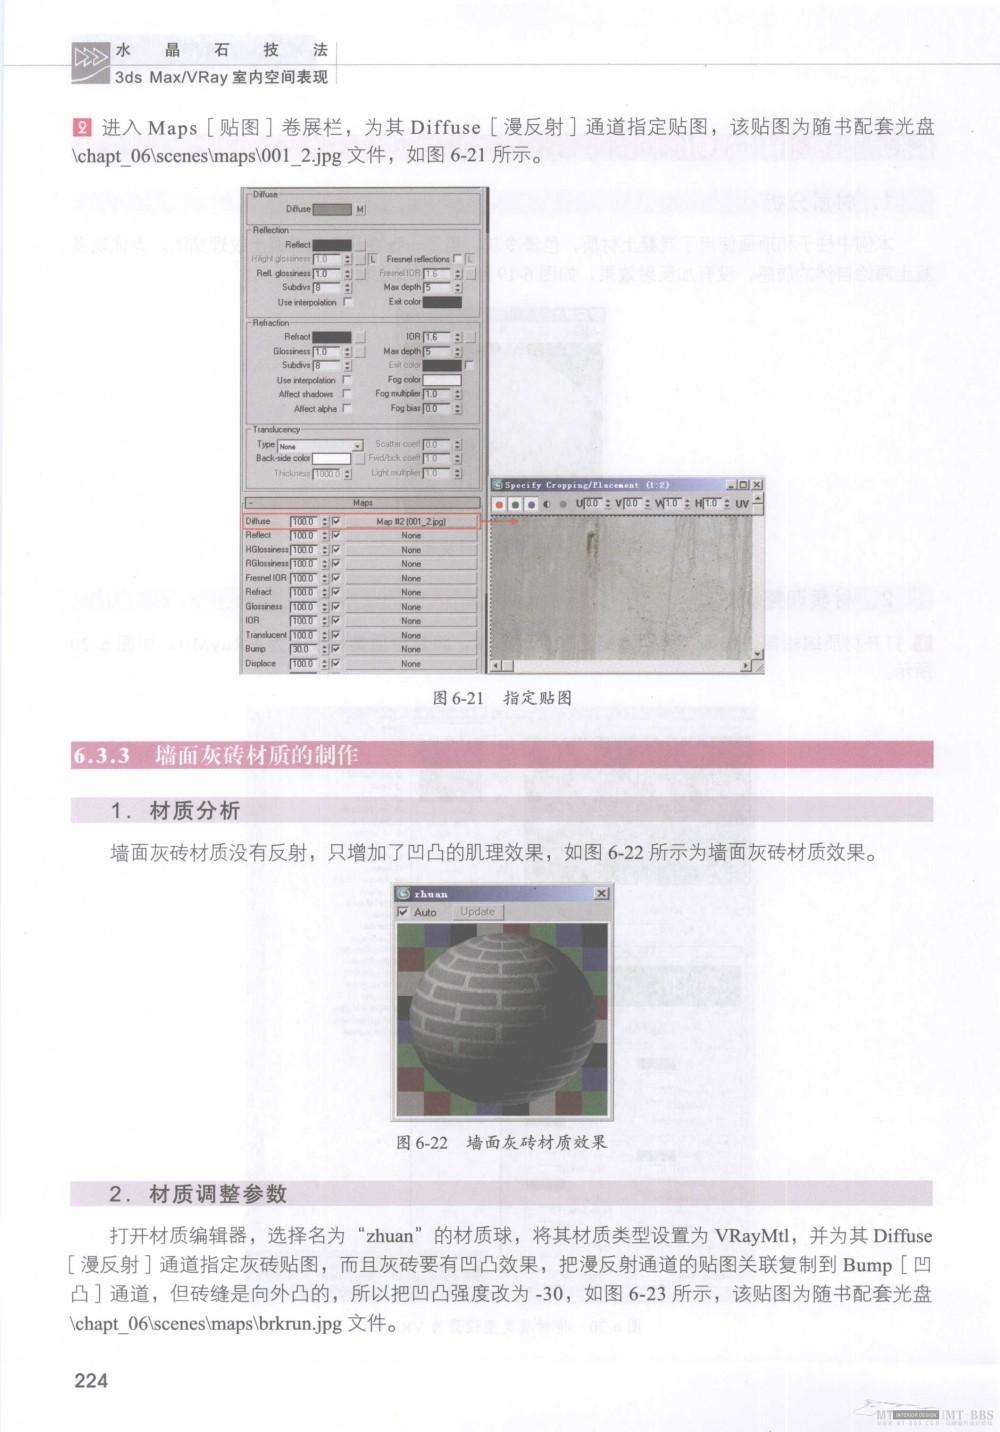 水晶石技法-3ds_Max&VRay室内空间表现_水晶石技法-3ds_Max&VRay室内空间表现_页面_230.jpg